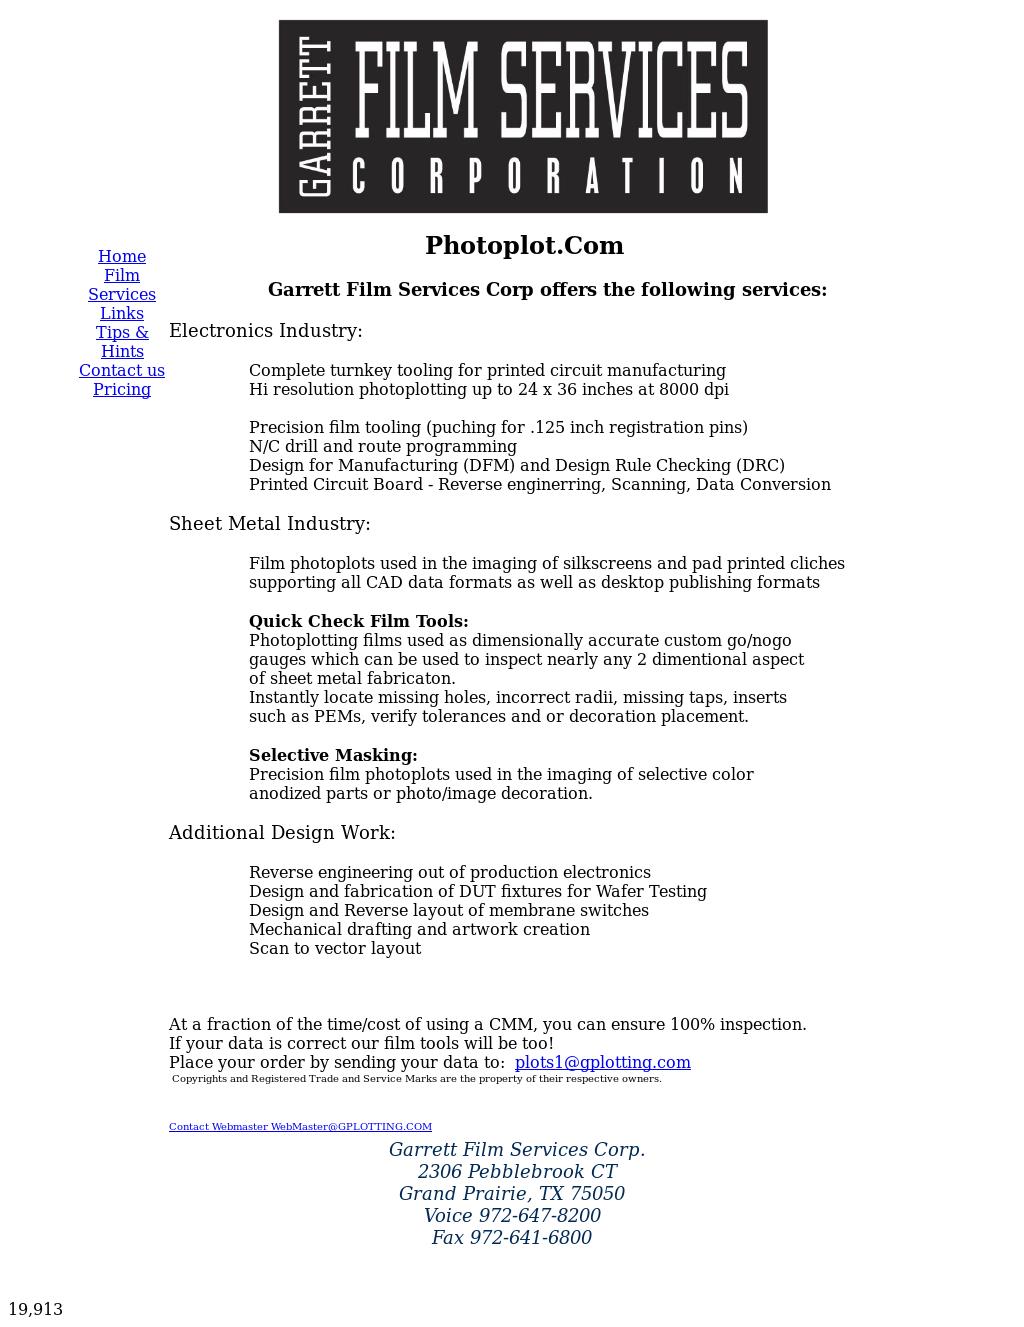 Garrett Film Competitors, Revenue and Employees - Owler